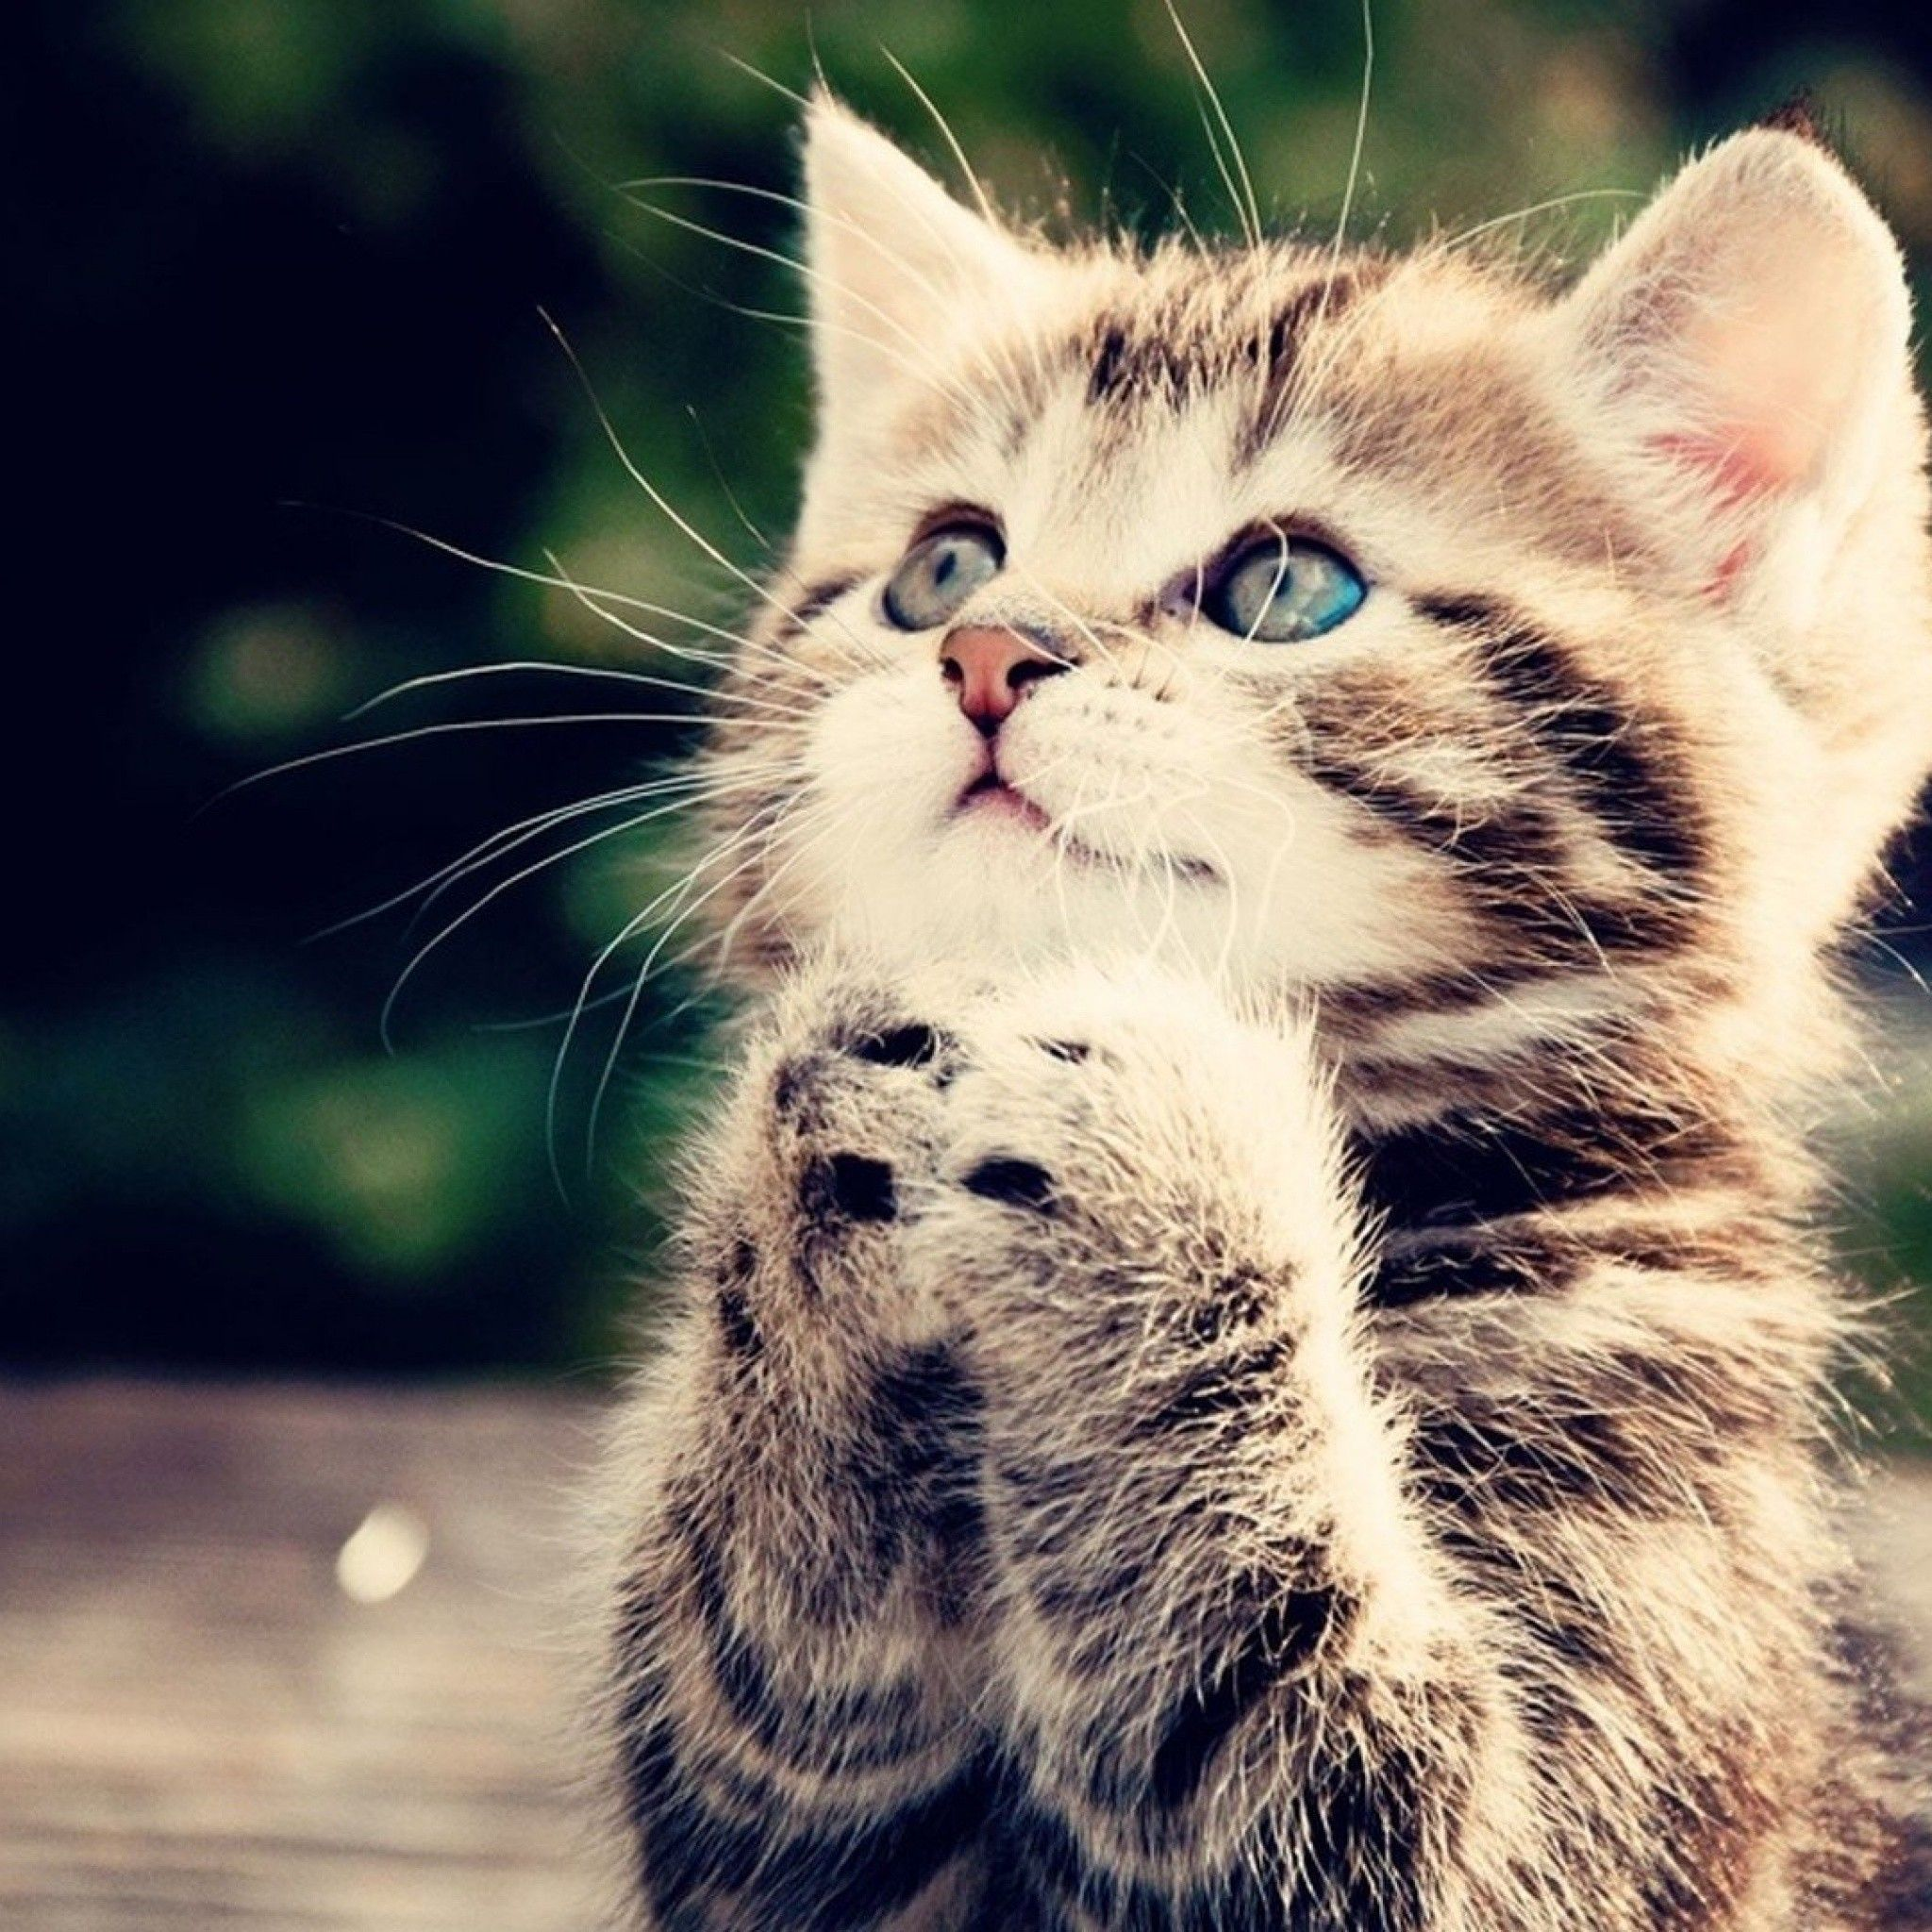 Playing Cute Kittens Ipad Wallpaper Kittens Cutest Cat Wallpaper Space Cat